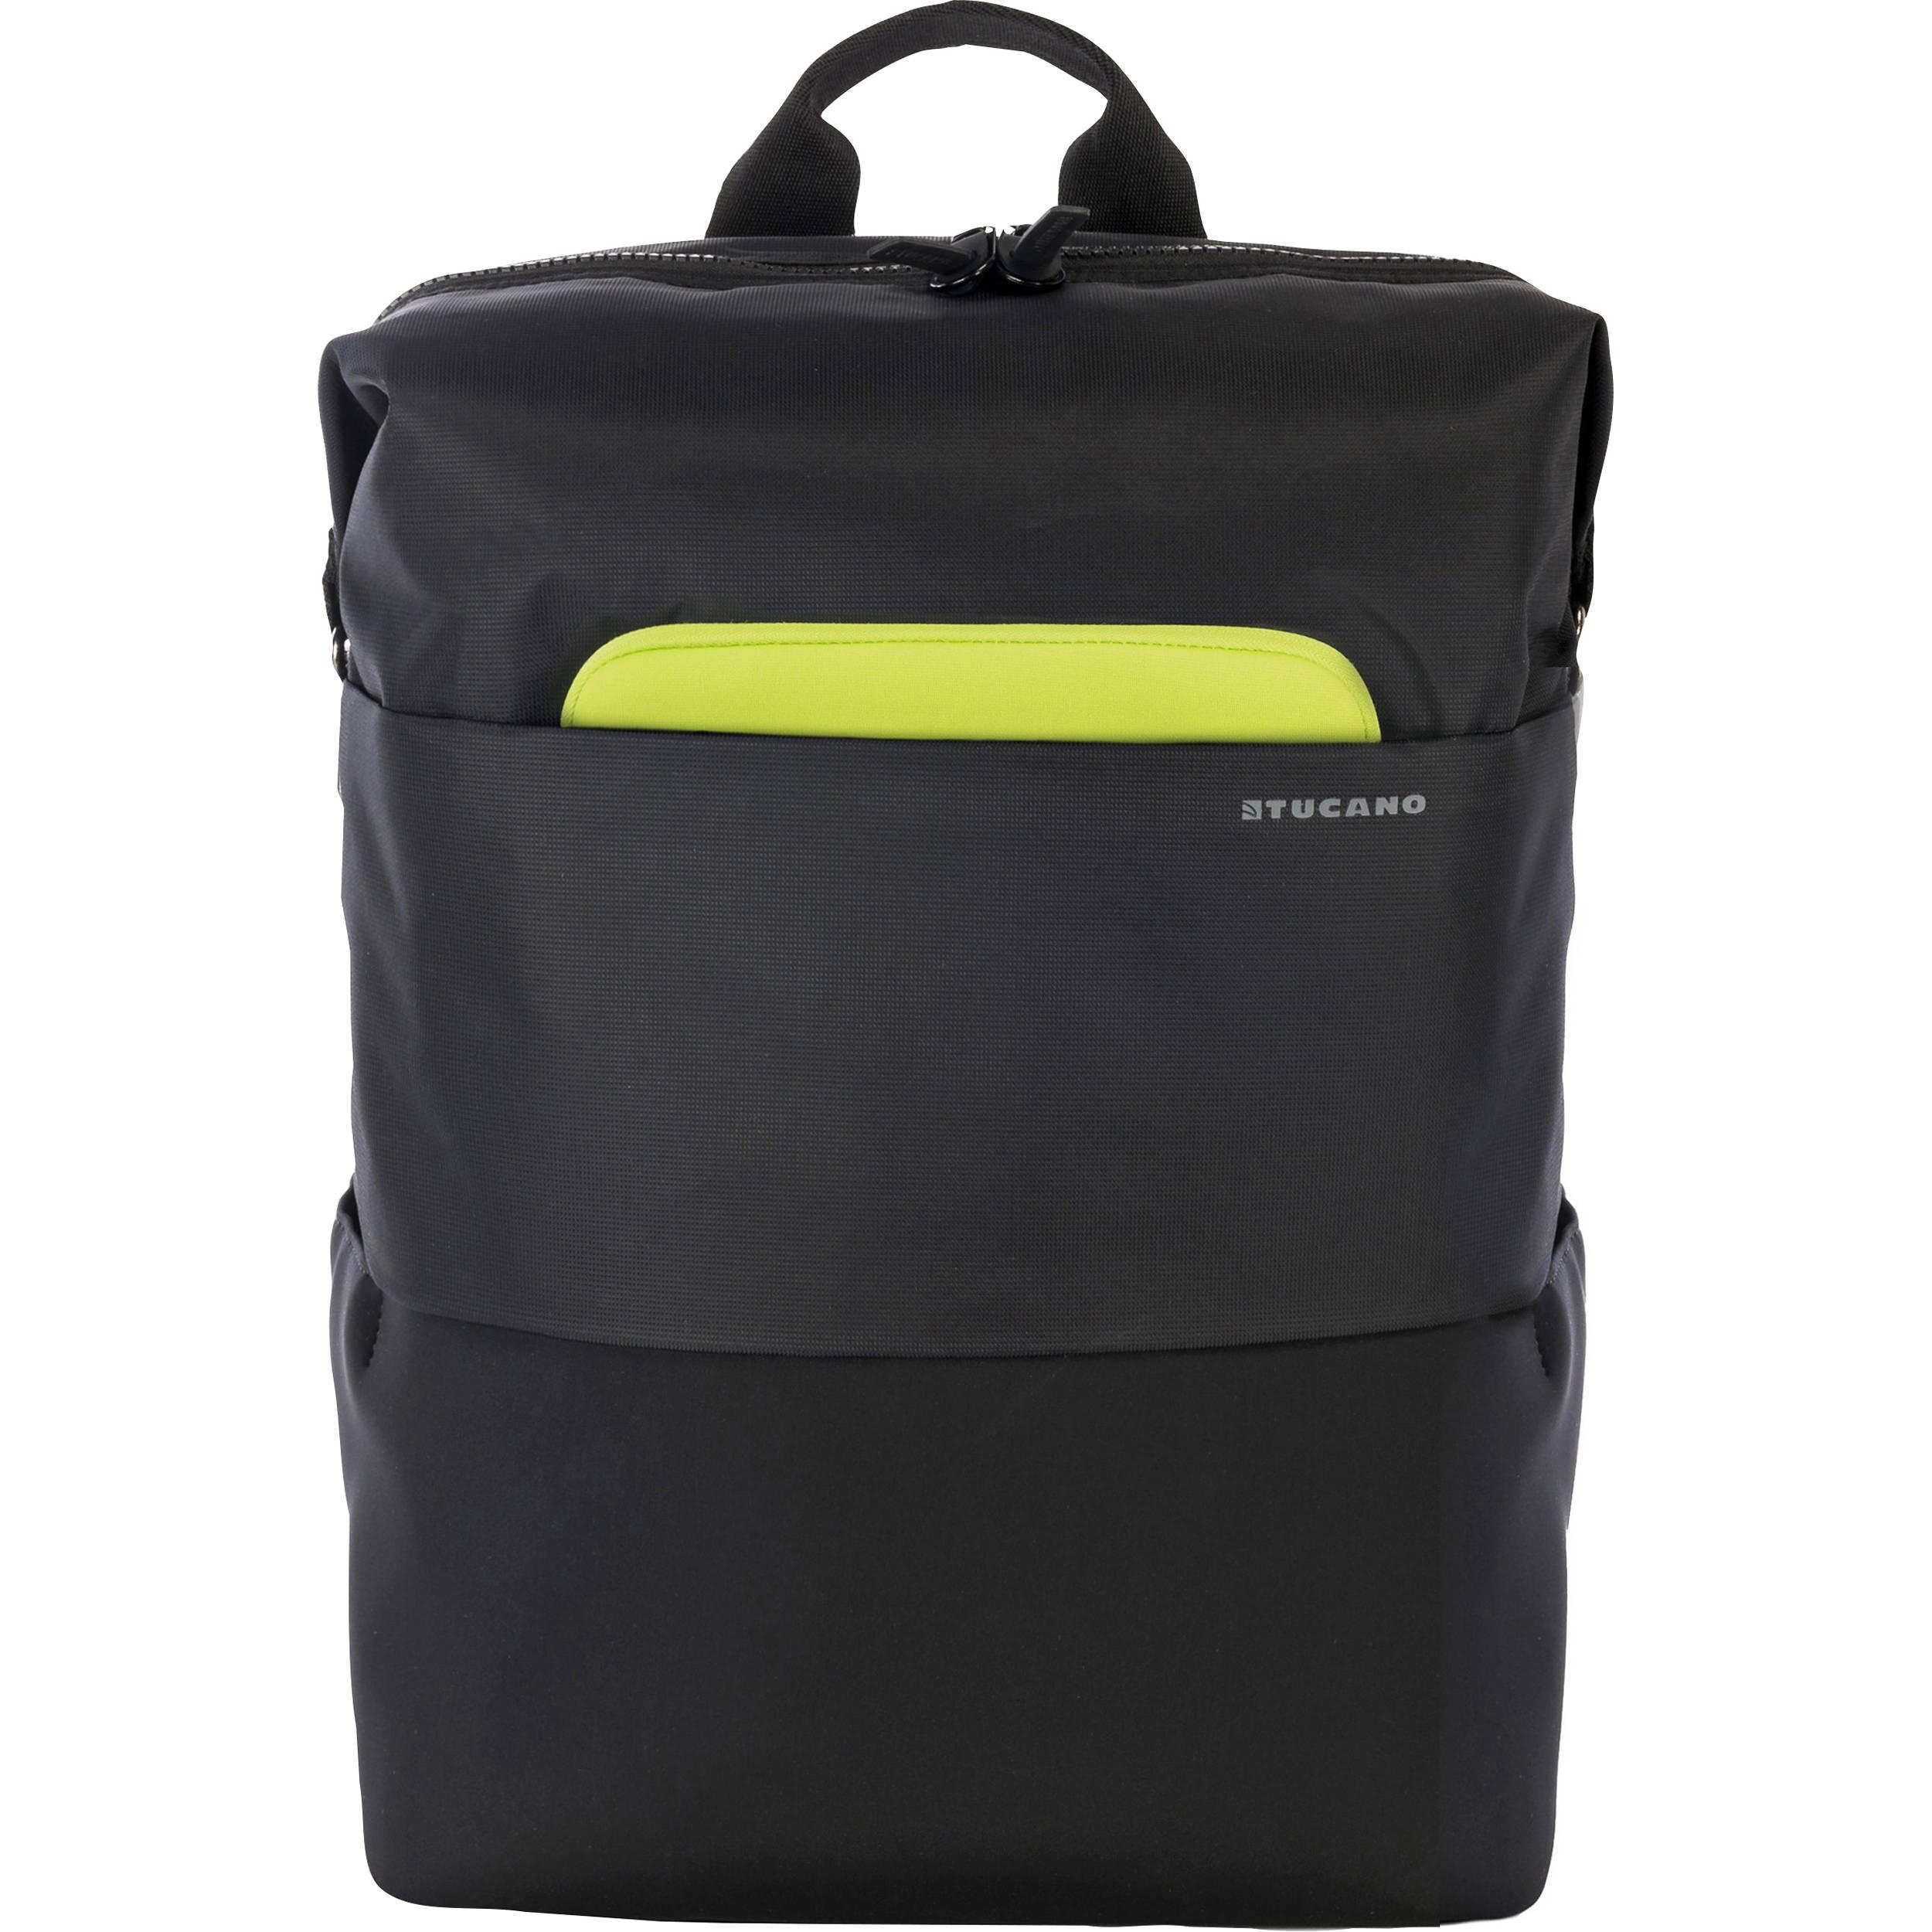 Tucano Modo Business Backpack for MacBook